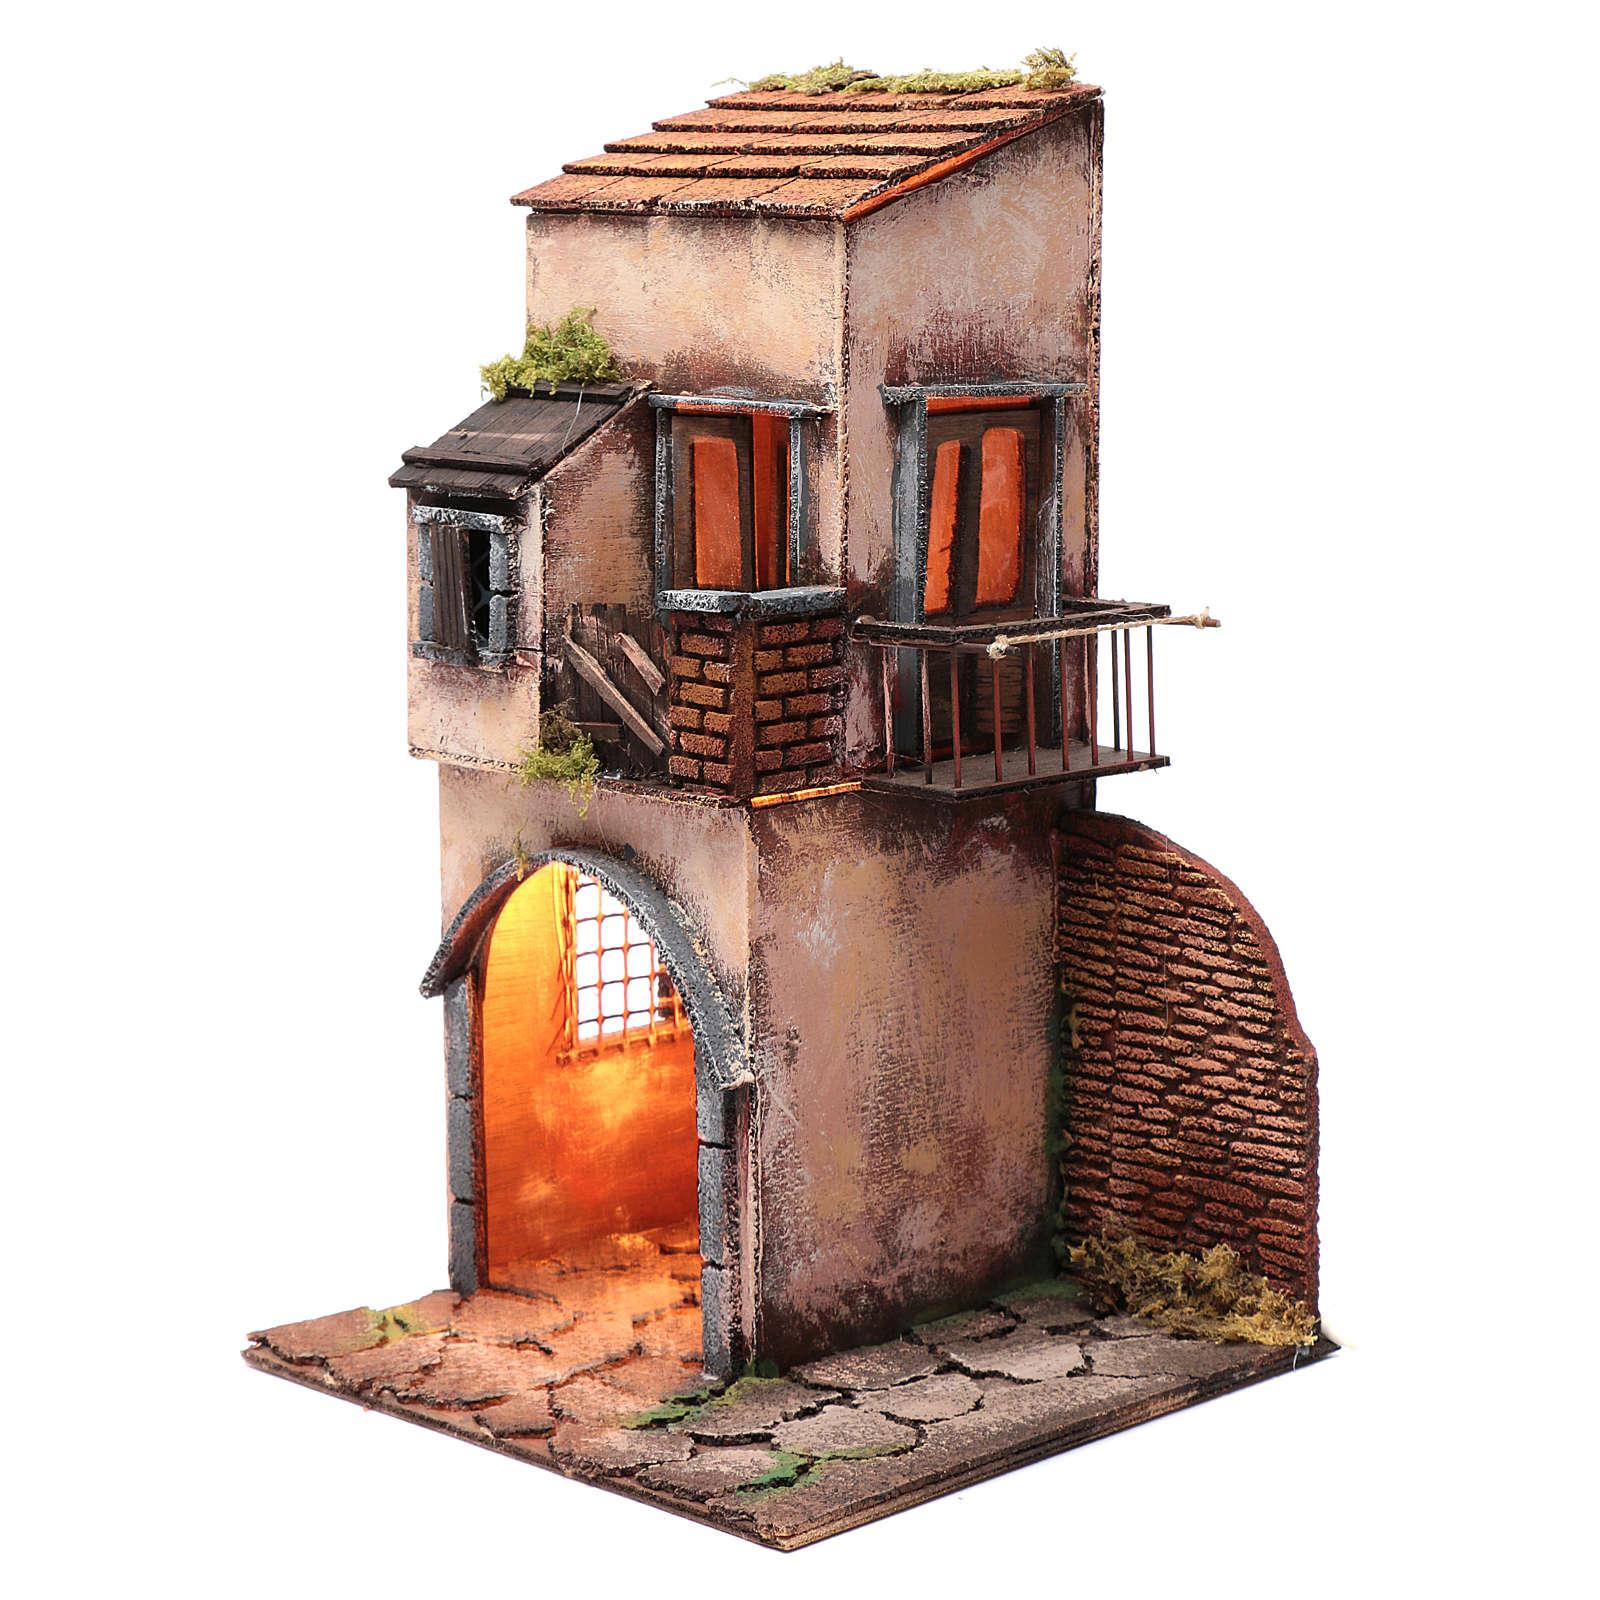 House with balcony and hut 50x25x25 cm  Neapolitan nativity scene 4